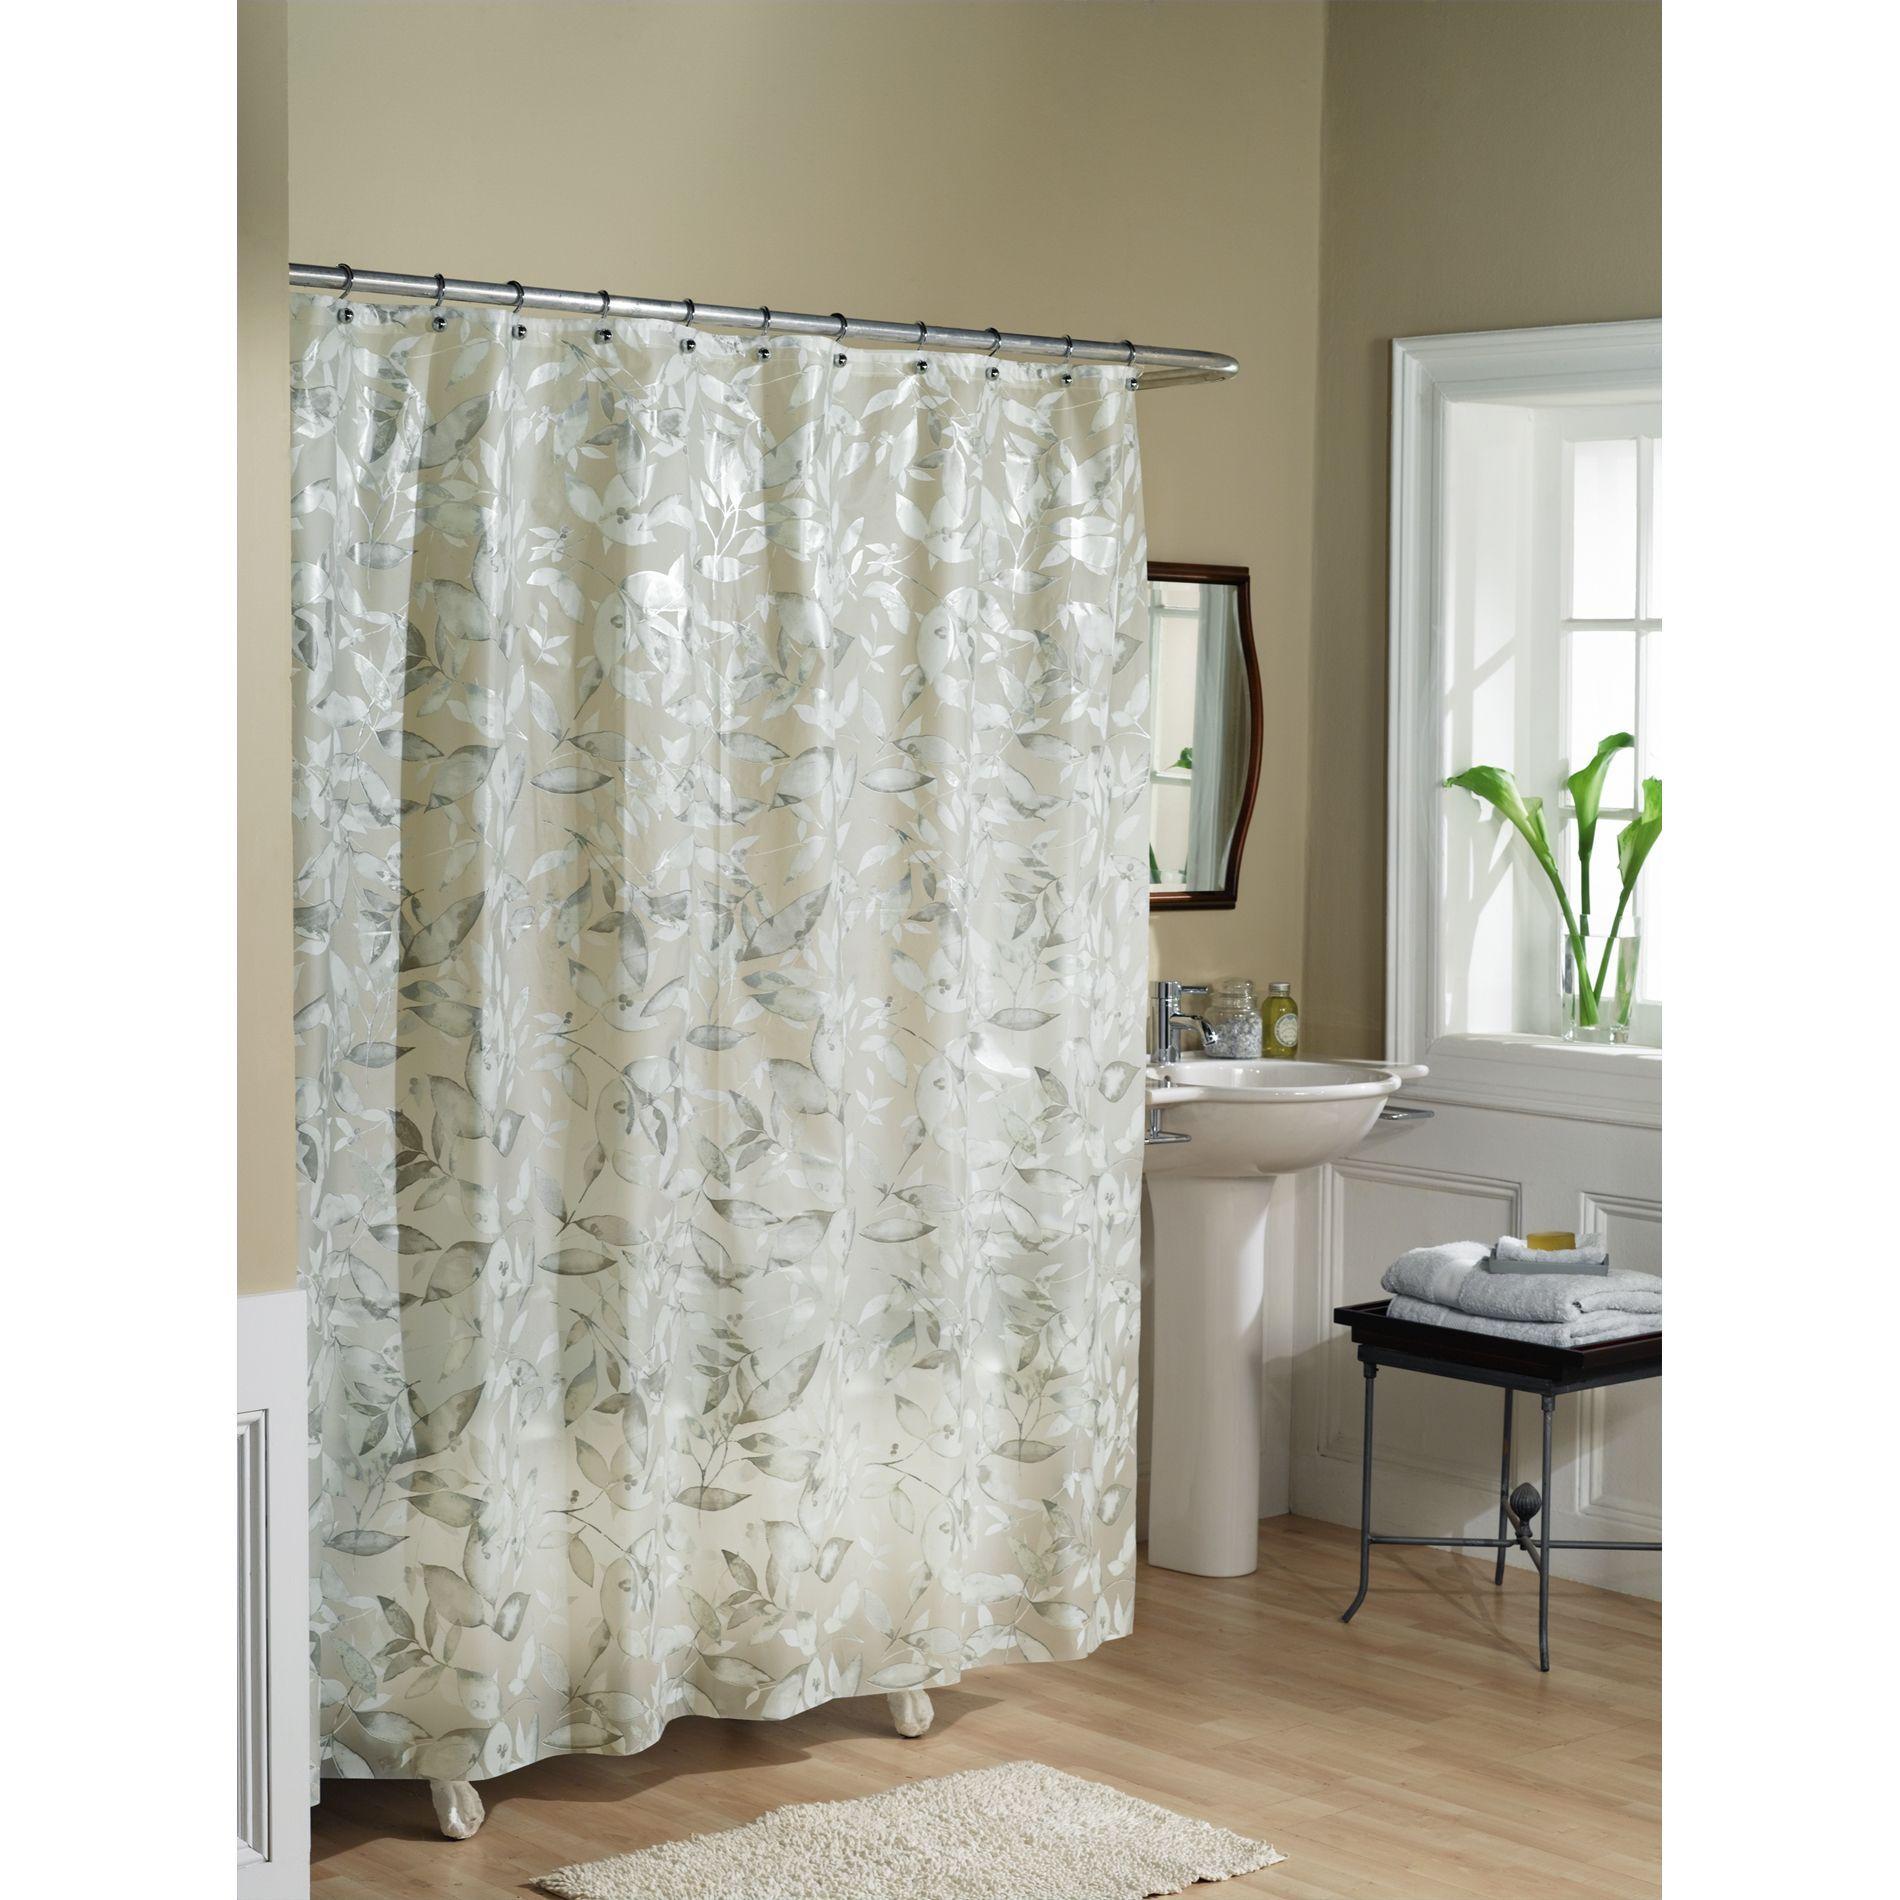 23 Elegant Bathroom Shower Curtain Ideas Photos Remodel And Pleasing Elegant Bathroom Shower Curtains Design Decoration